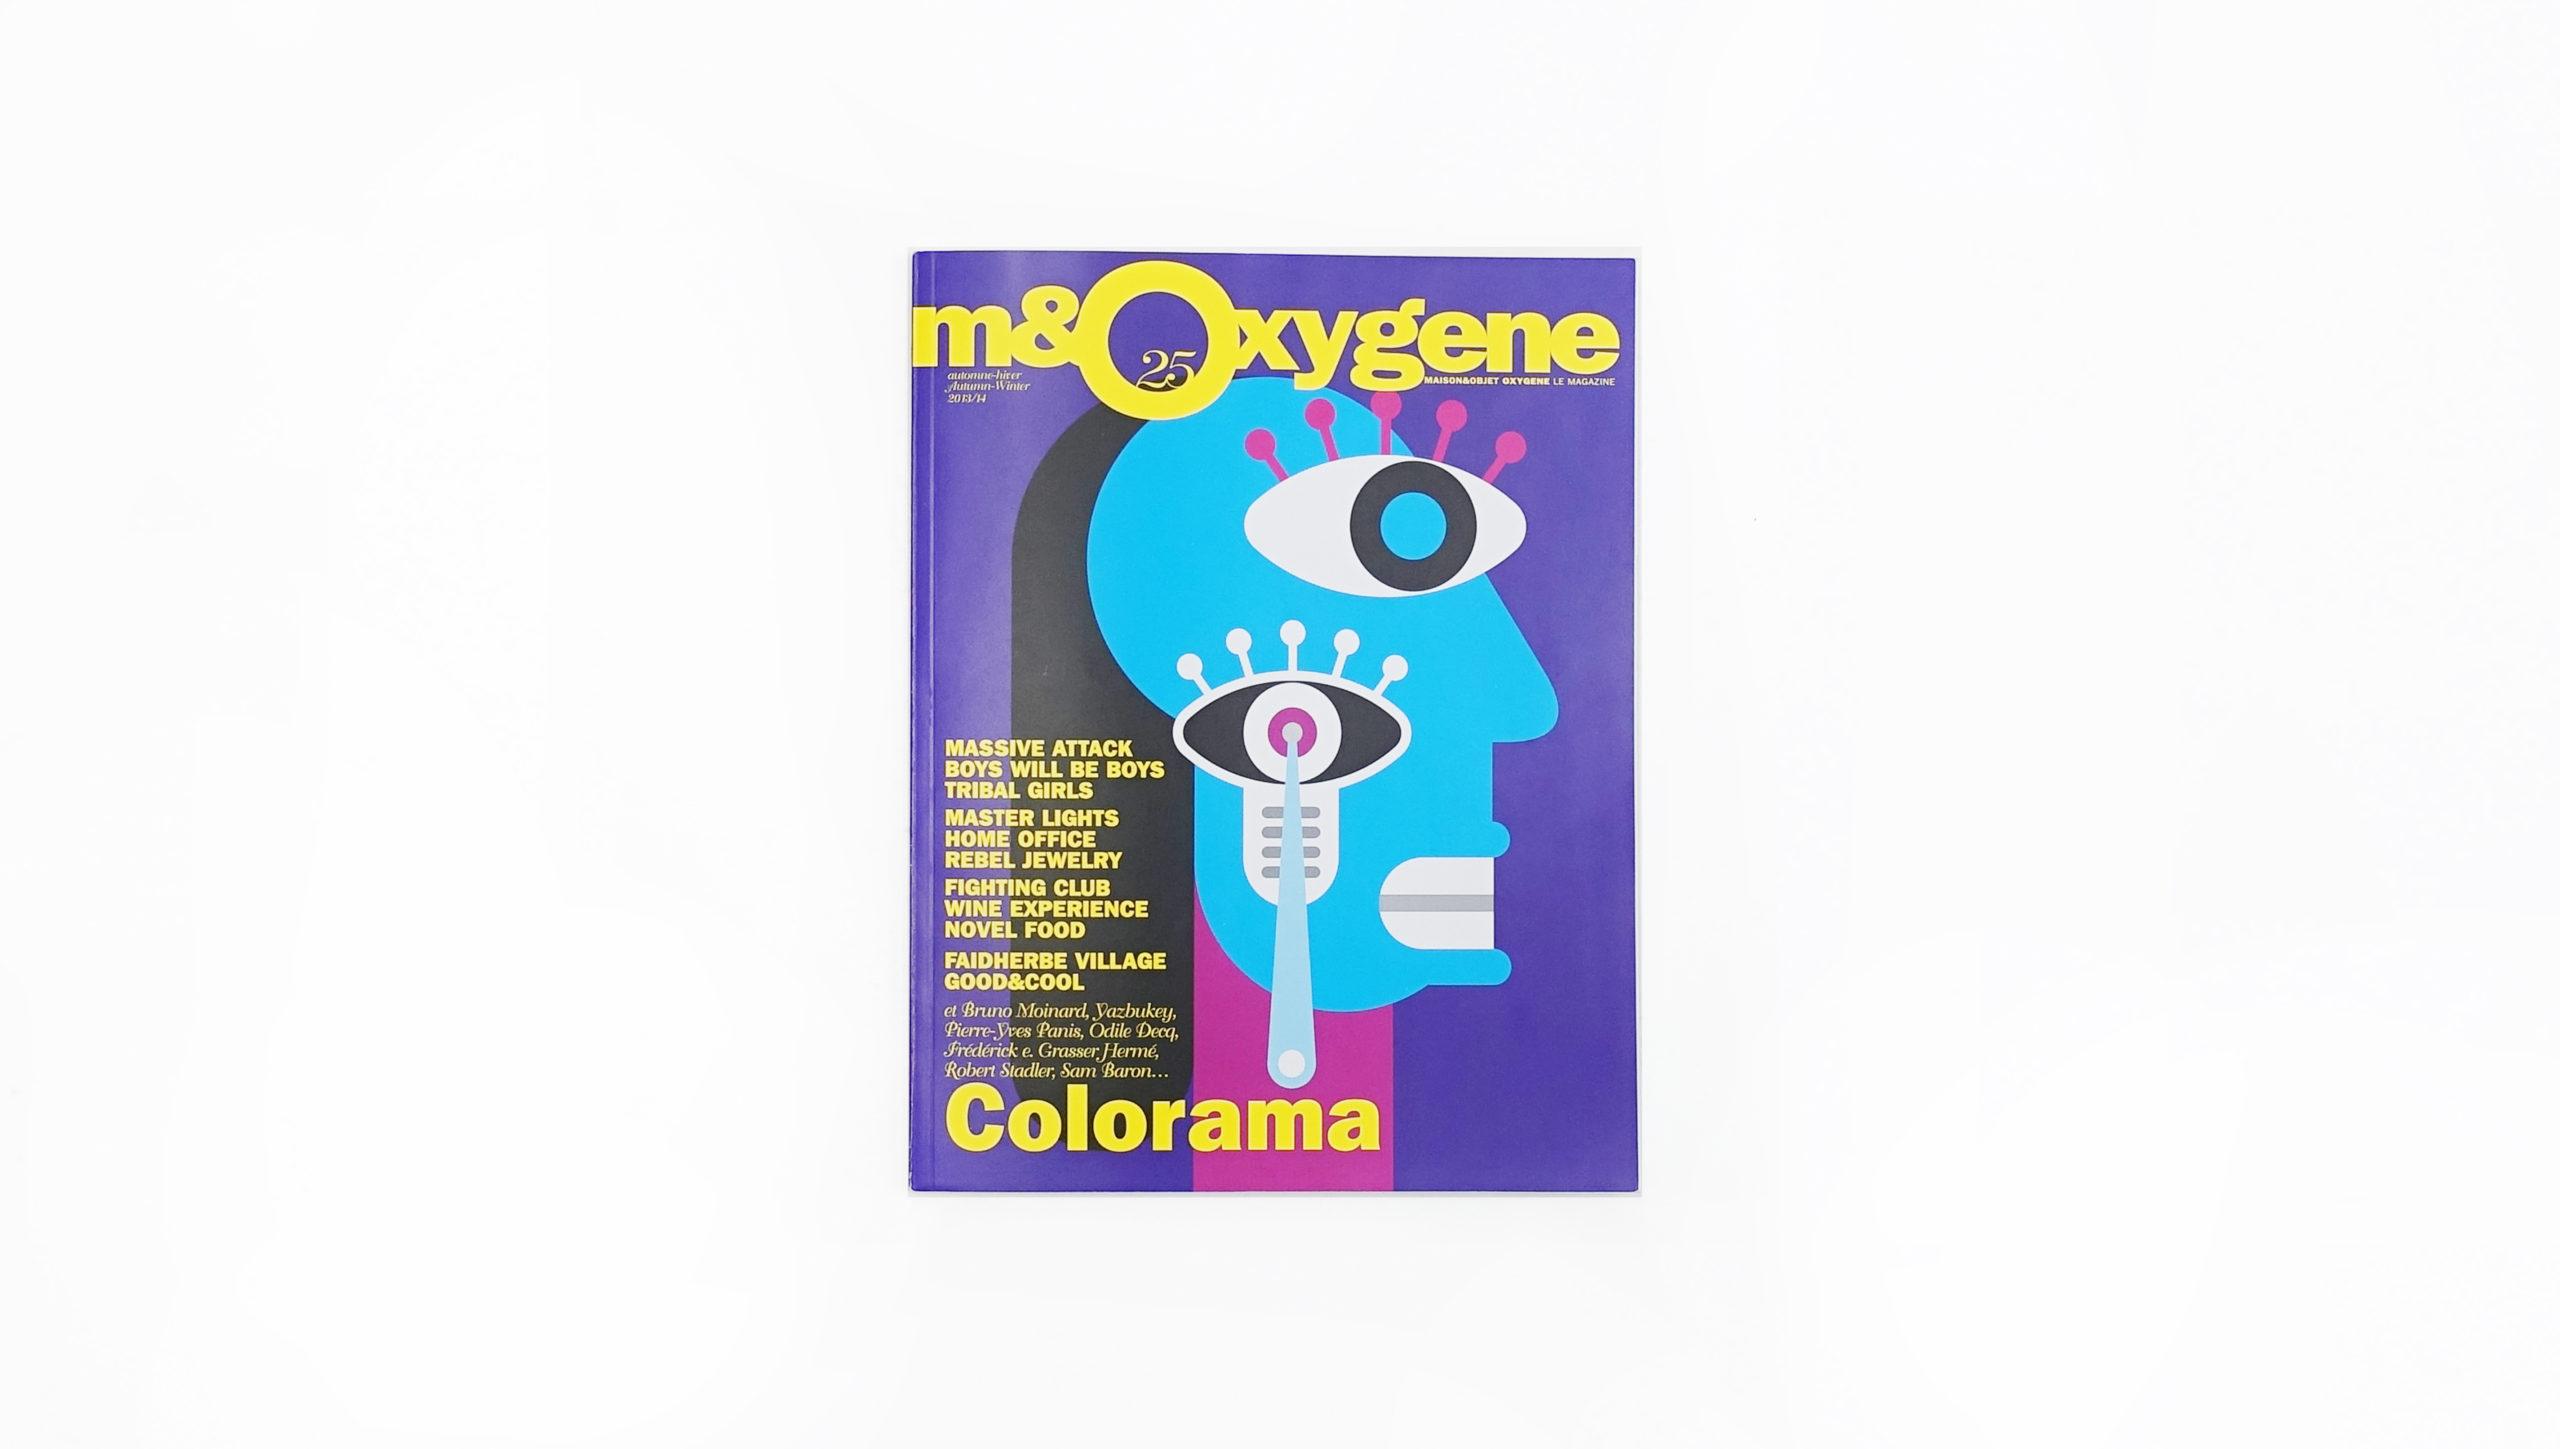 m&oxygene April / 2013